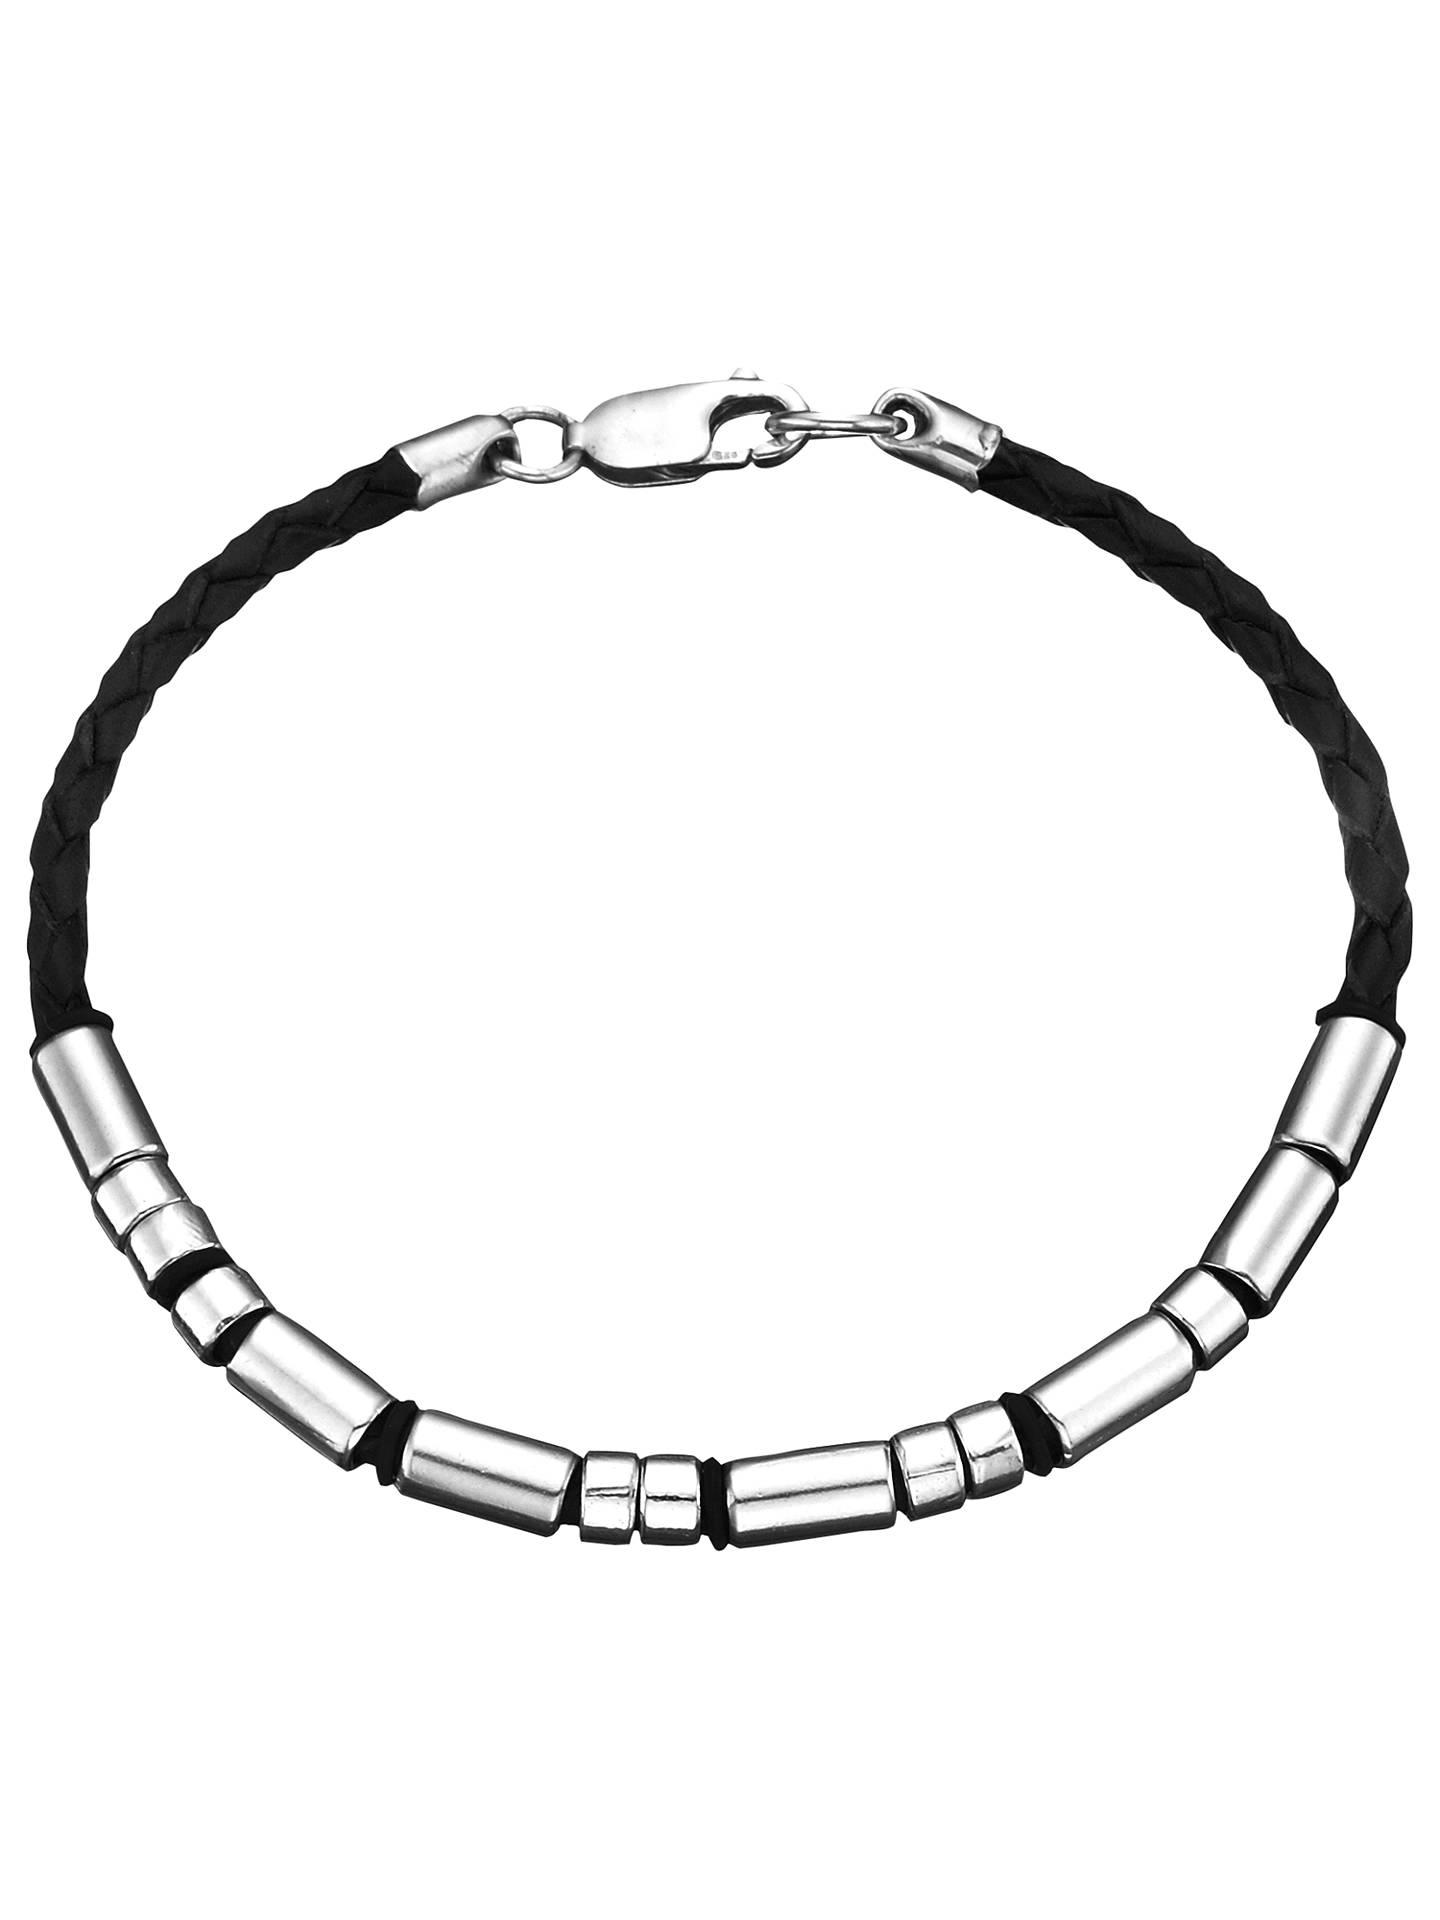 e09bd1d62ee37 Under the Rose Personalised Morse Code Leather Bracelet